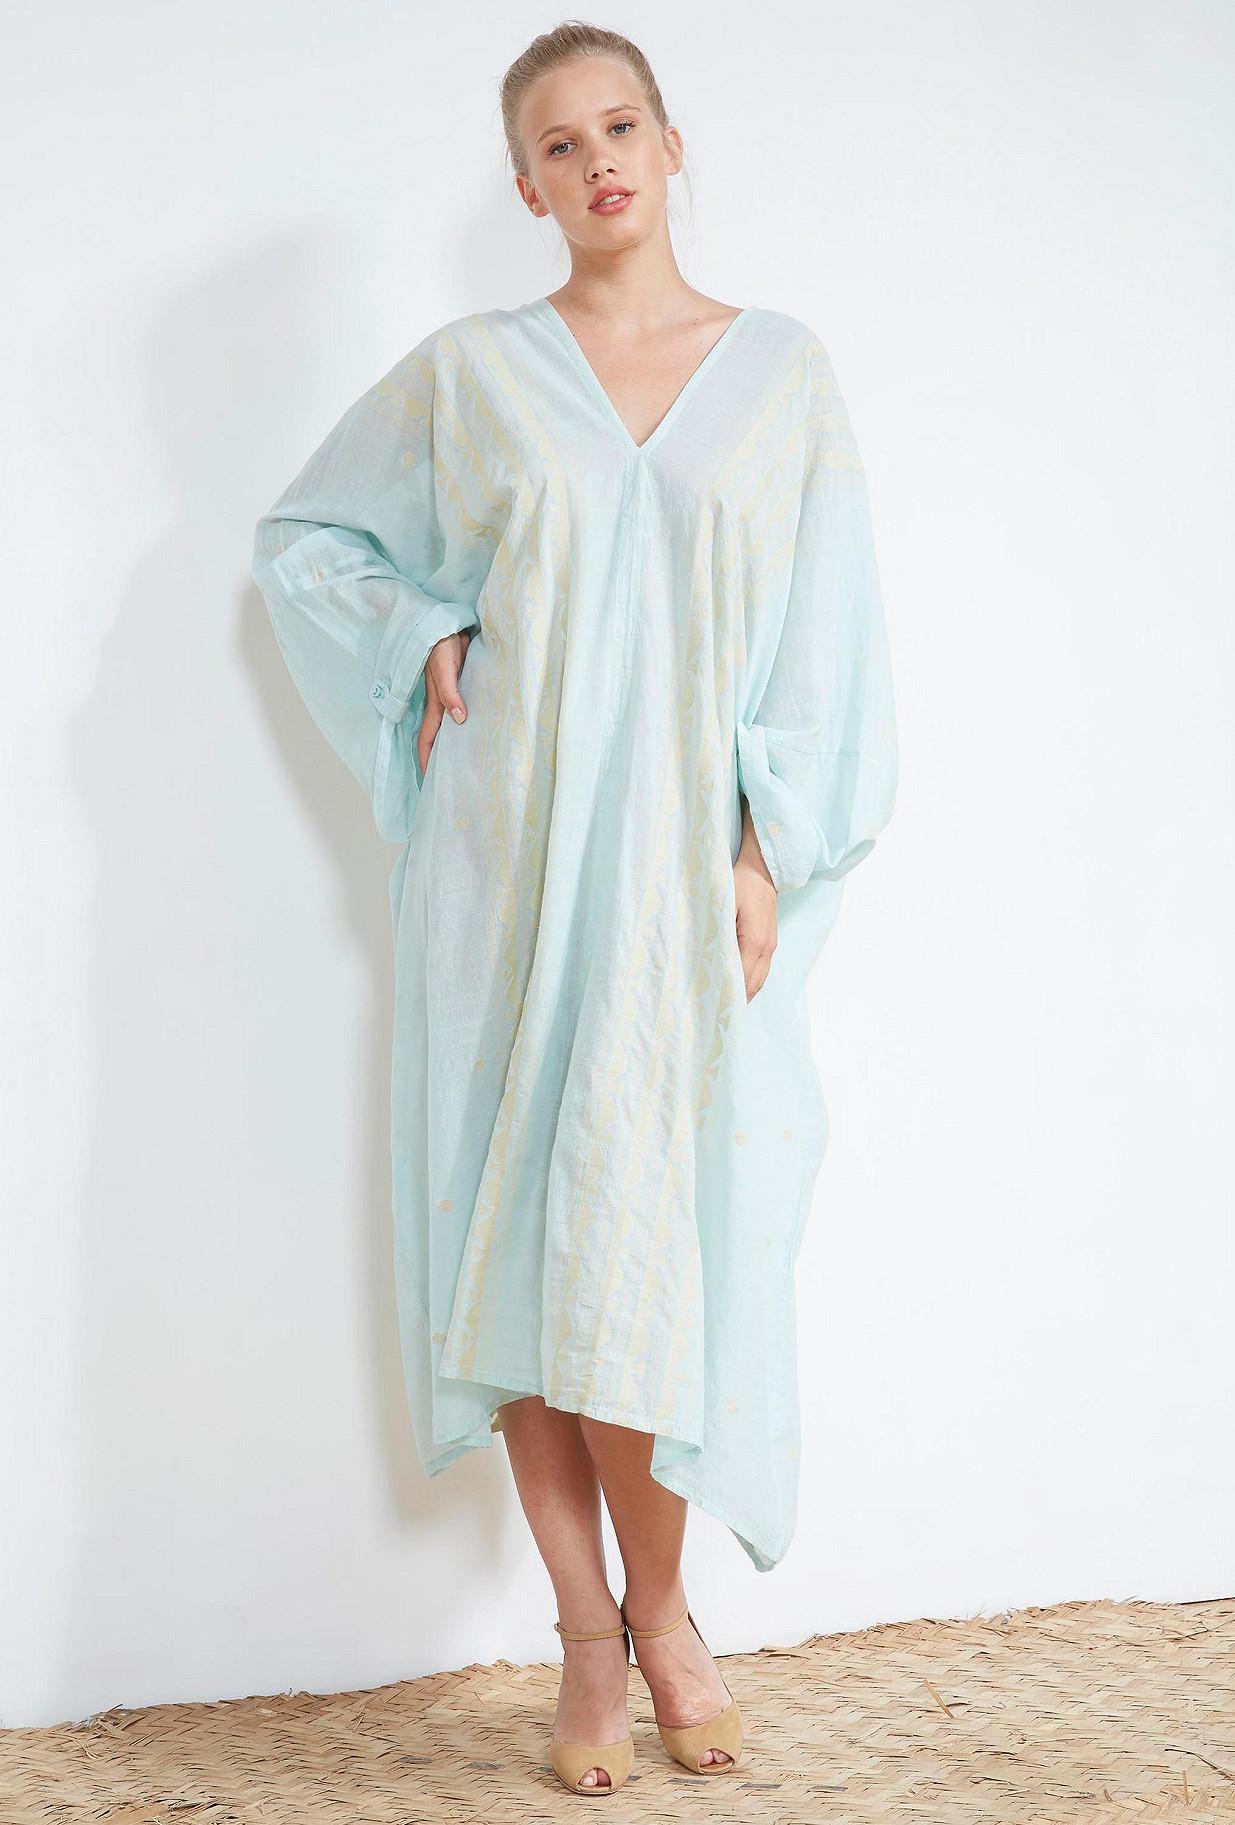 Aqua  KIMONO  Thebes Mes demoiselles fashion clothes designer Paris